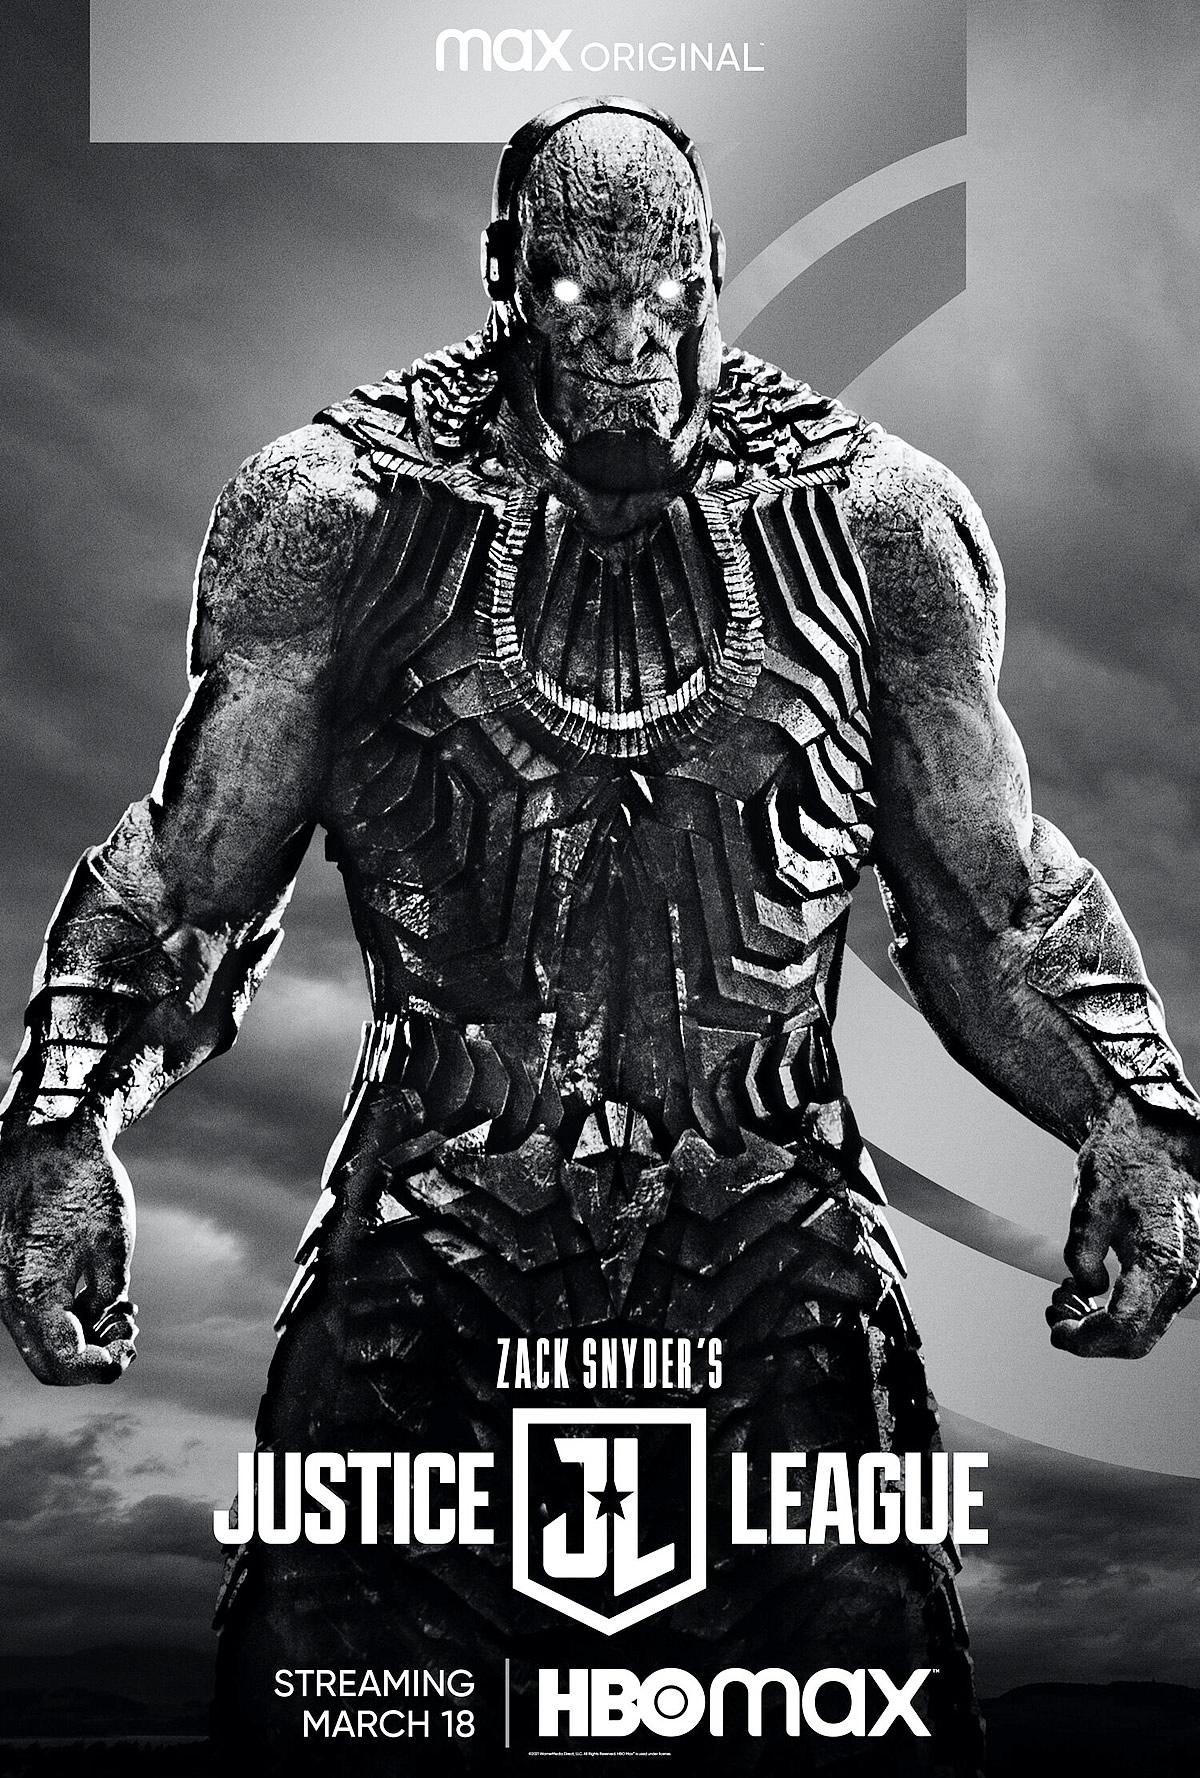 snyder cut liga da justica de zack snyder trailer com lobo da estepe e darkseid - Snyder Cut | Liga da Justiça de Zack Snyder trailer com Lobo da Estepe e Darkseid